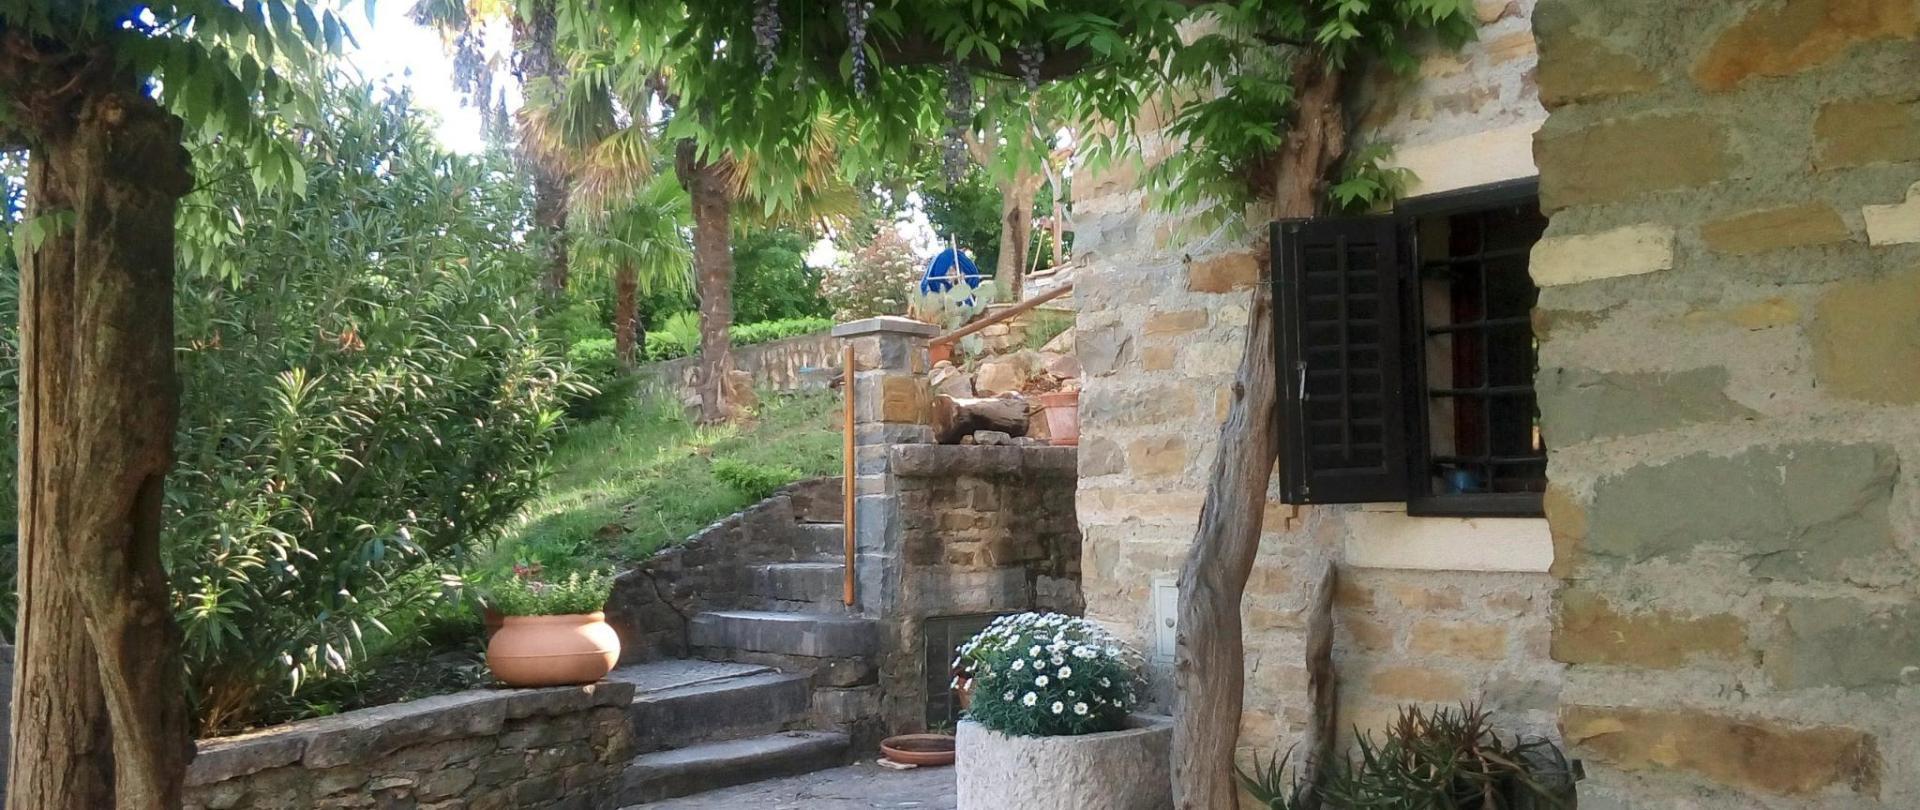 Homestead Histria Botanica.jpg